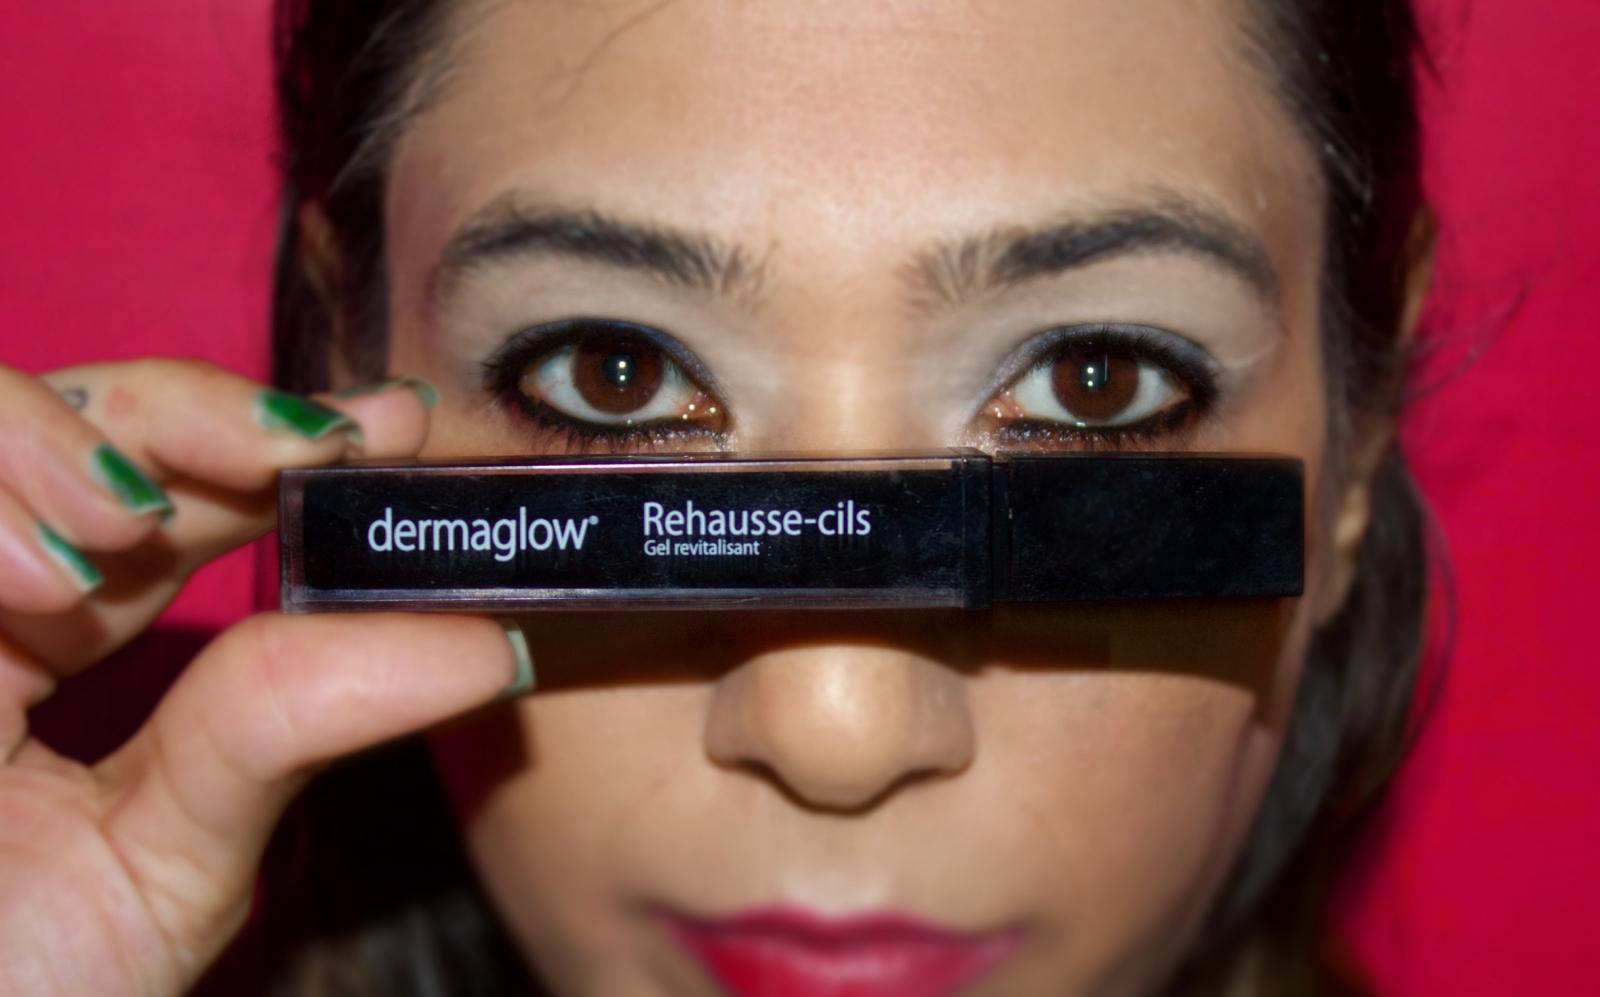 DermaGlow Lash Enhancing Serum